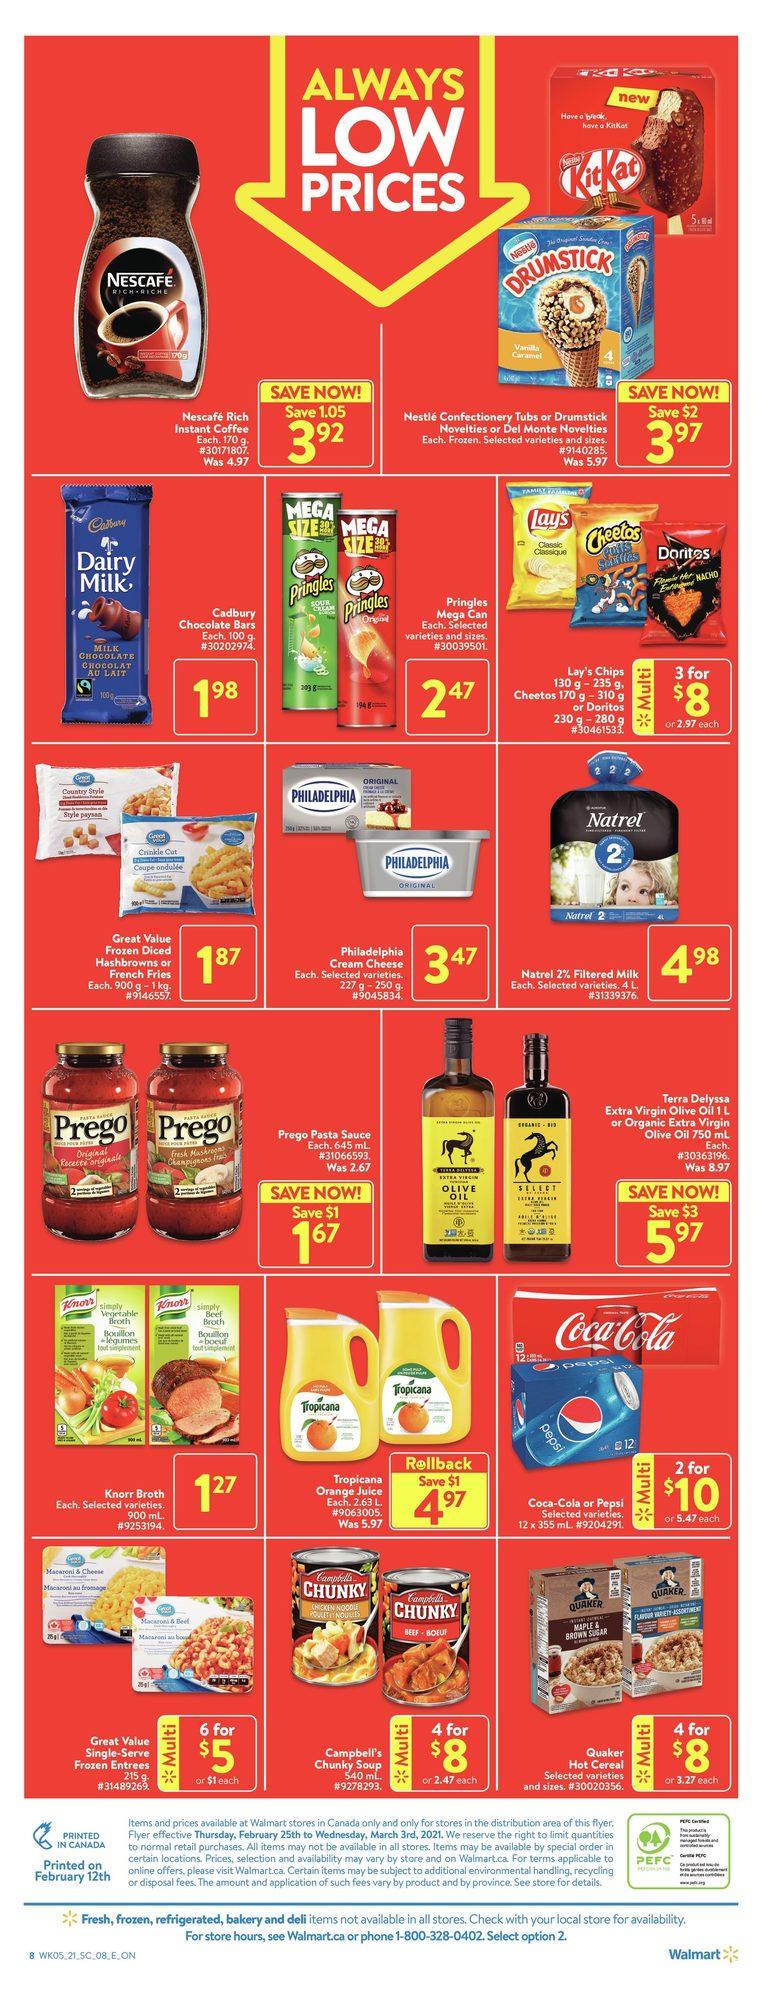 Walmart - Weekly Flyer Specials - Page 3